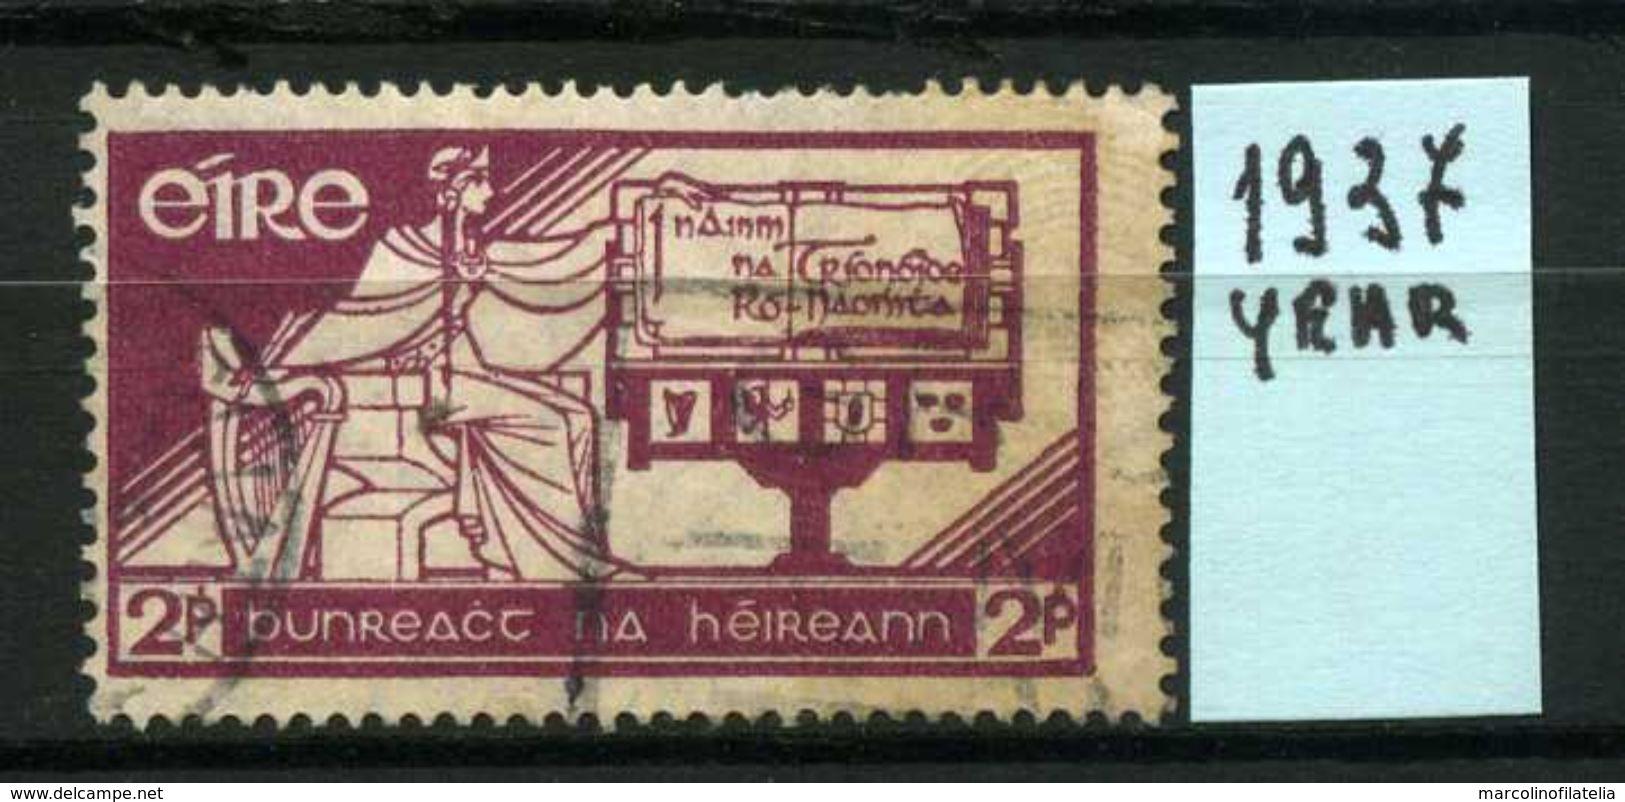 EIRE - IRLANDA - Year 1937 - Usato - Used - Utilisè - Gebraucht . - Usati